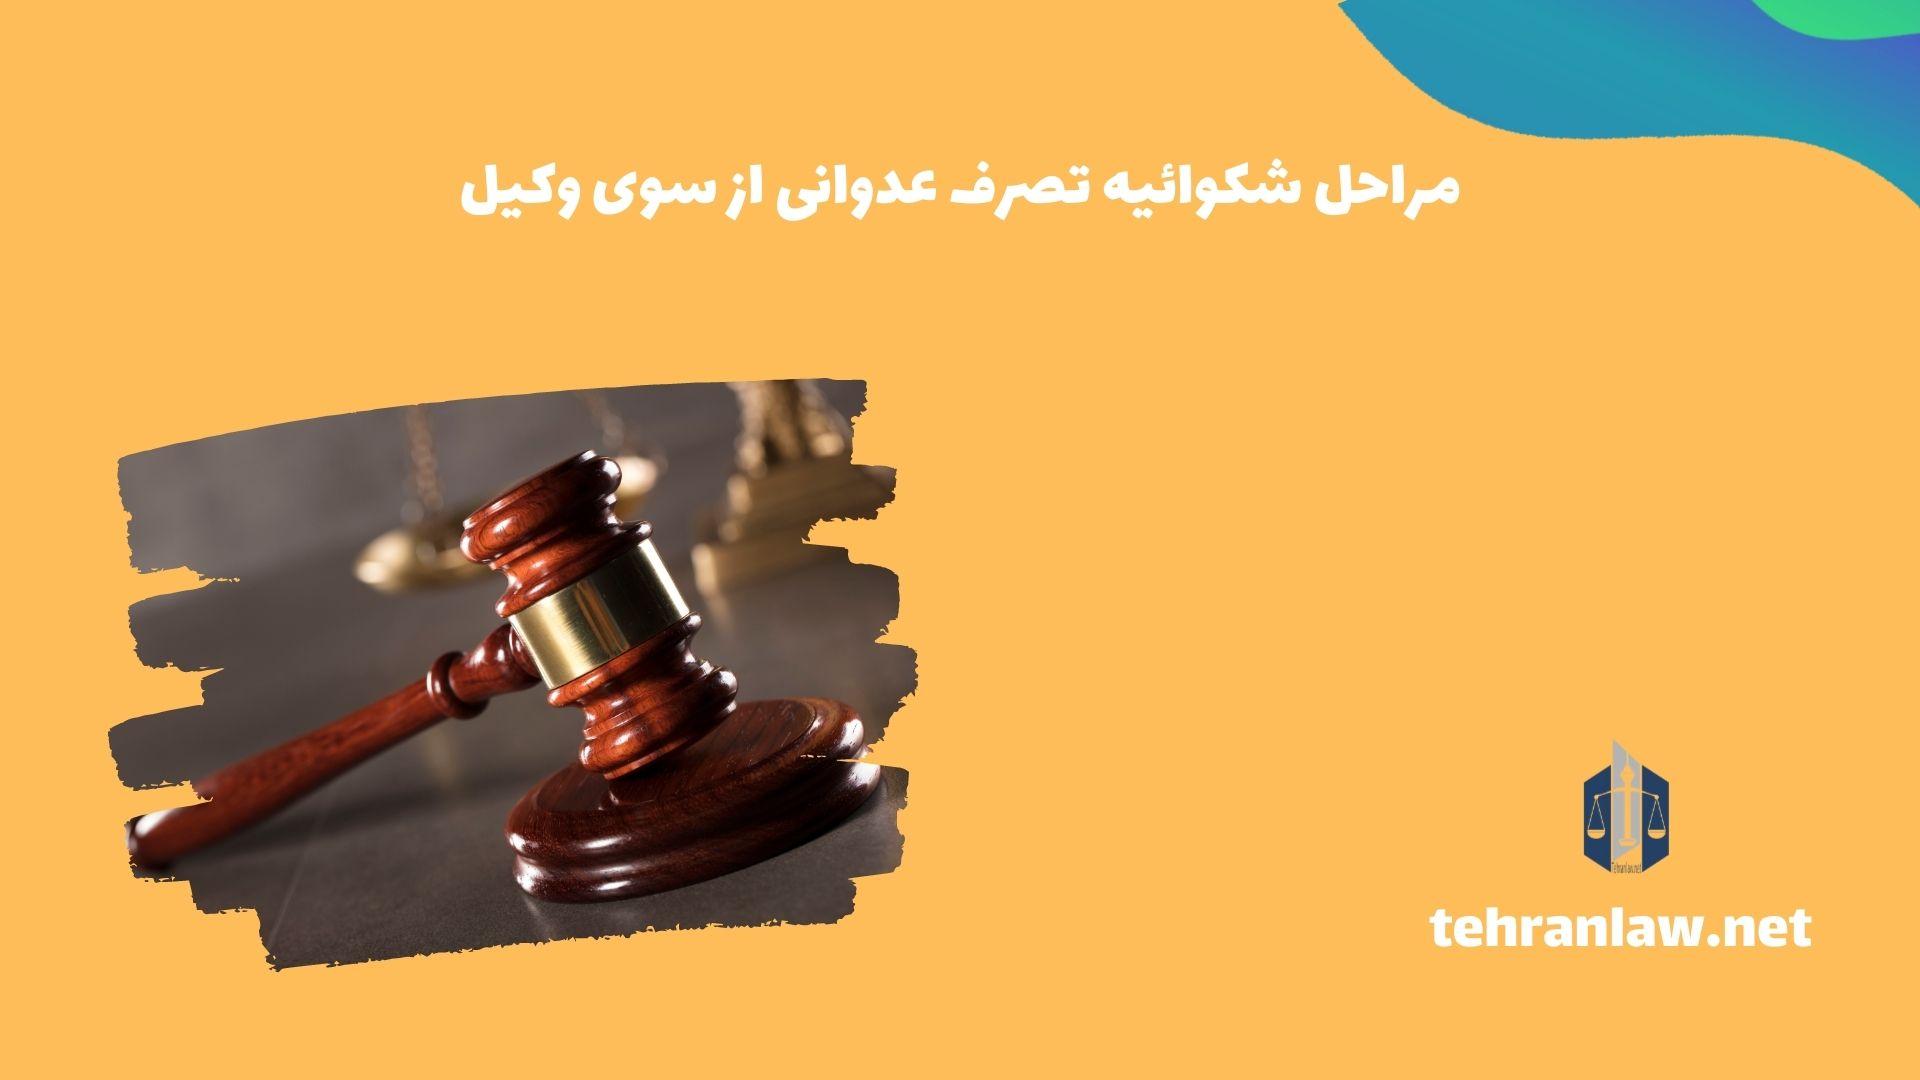 مراحل شکوائیه تصرف عدوانی از سوی وکیل